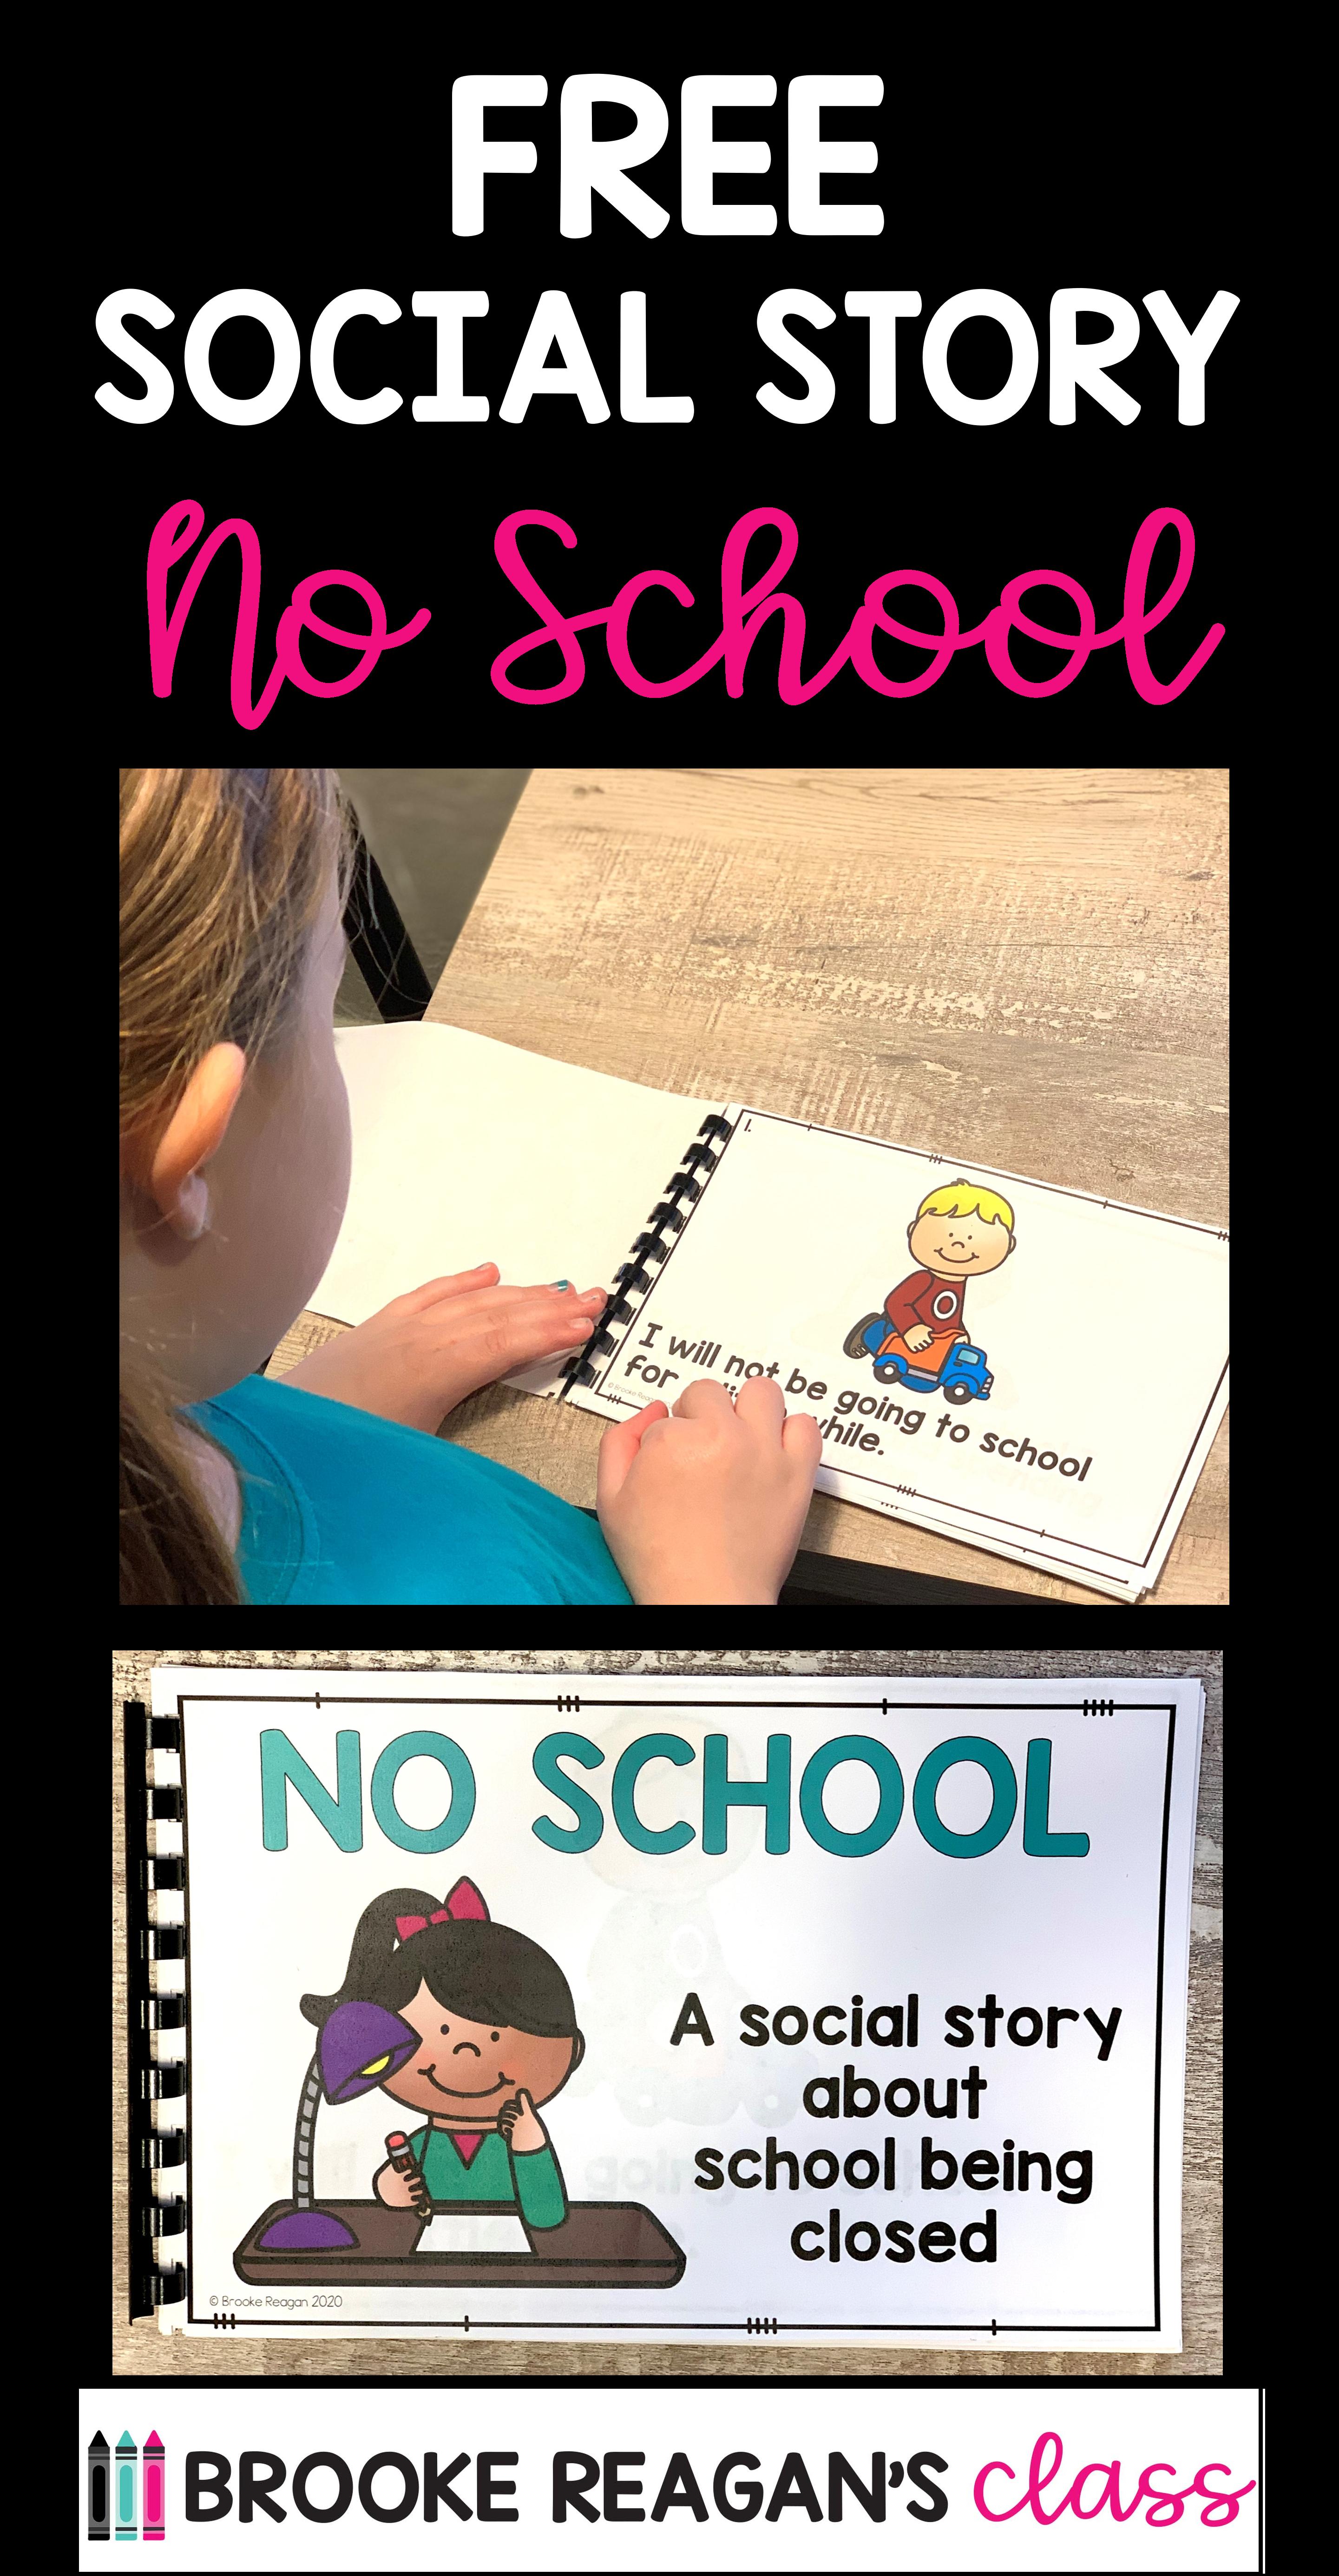 FREE Social Story: No School